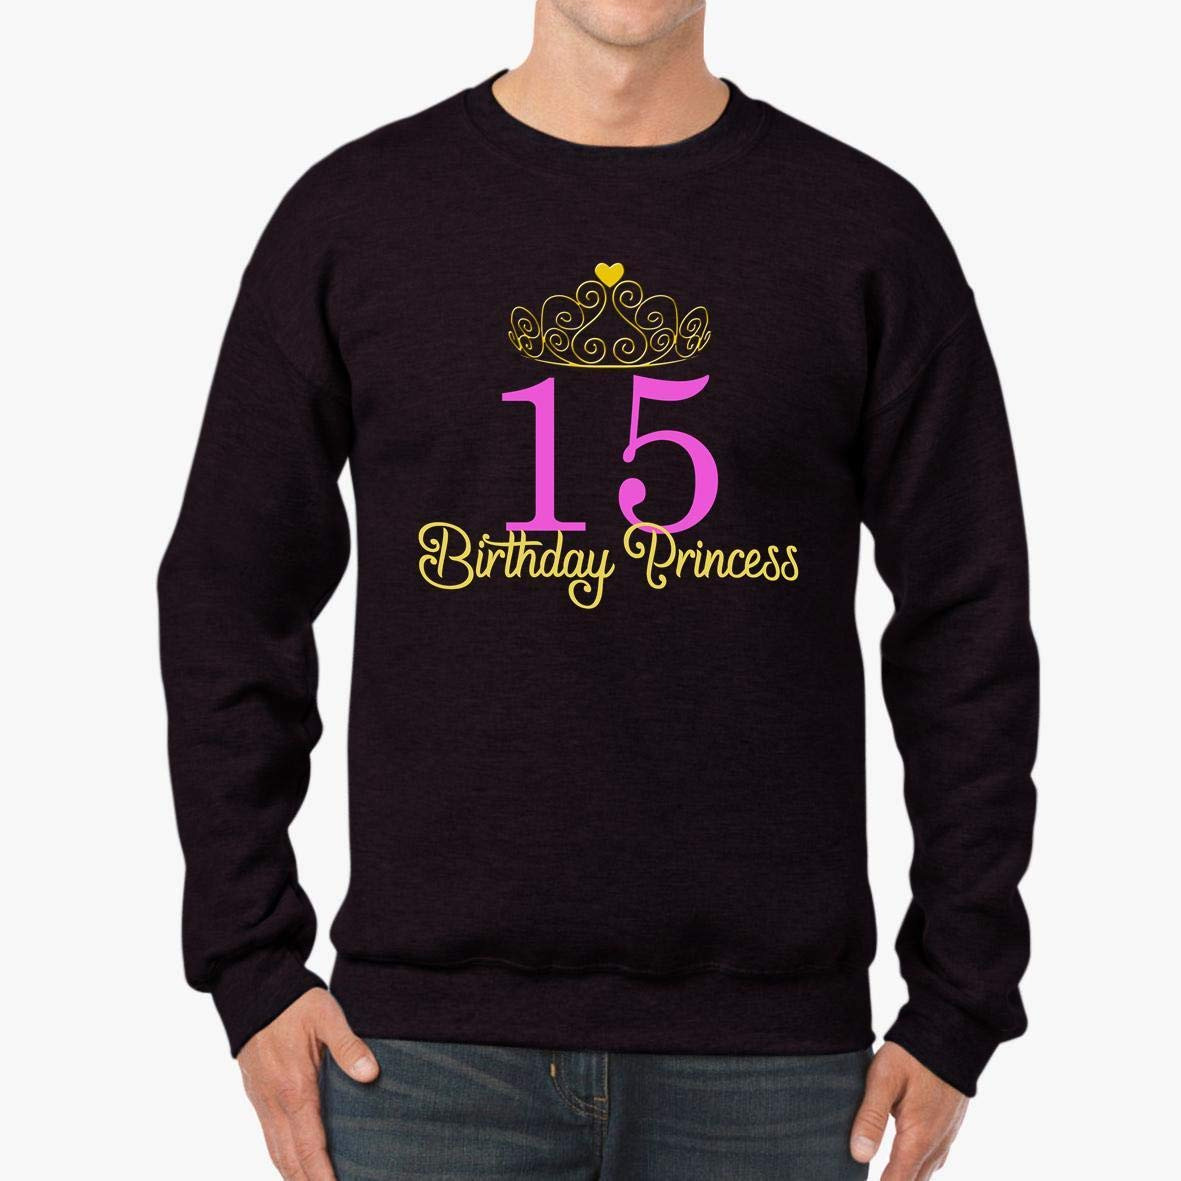 Gift 15th Birthday Princess Unisex Sweatshirt tee